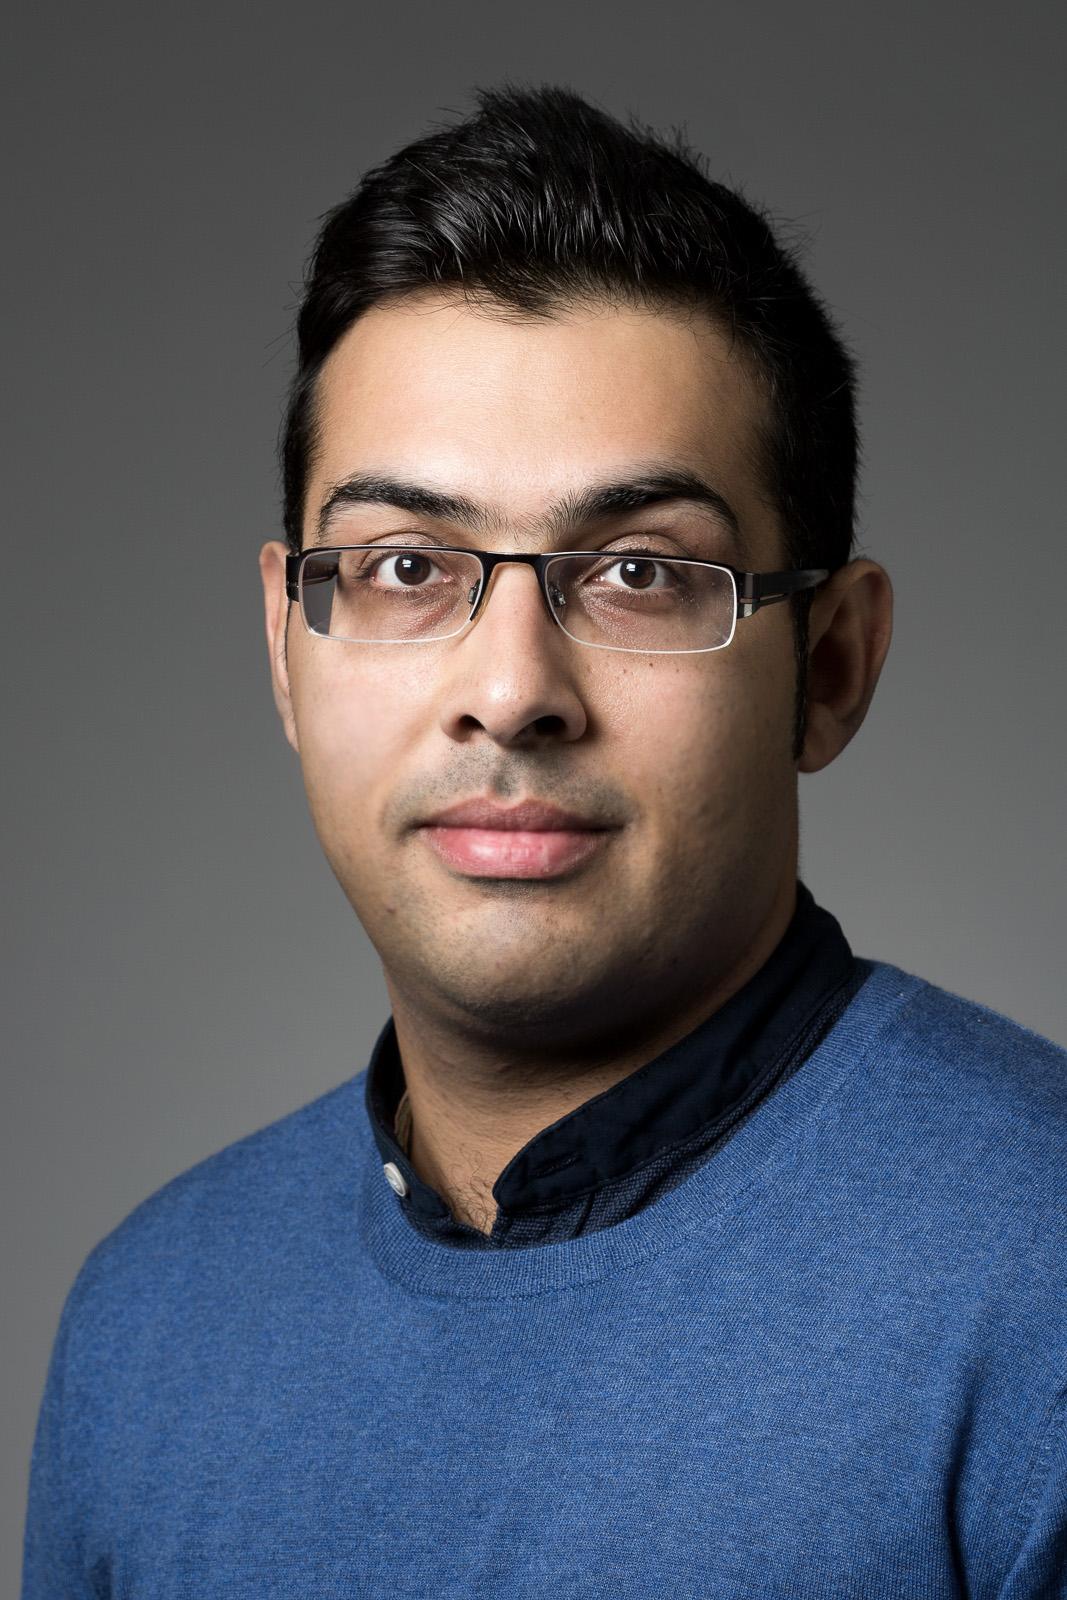 Ramin Aghababaei